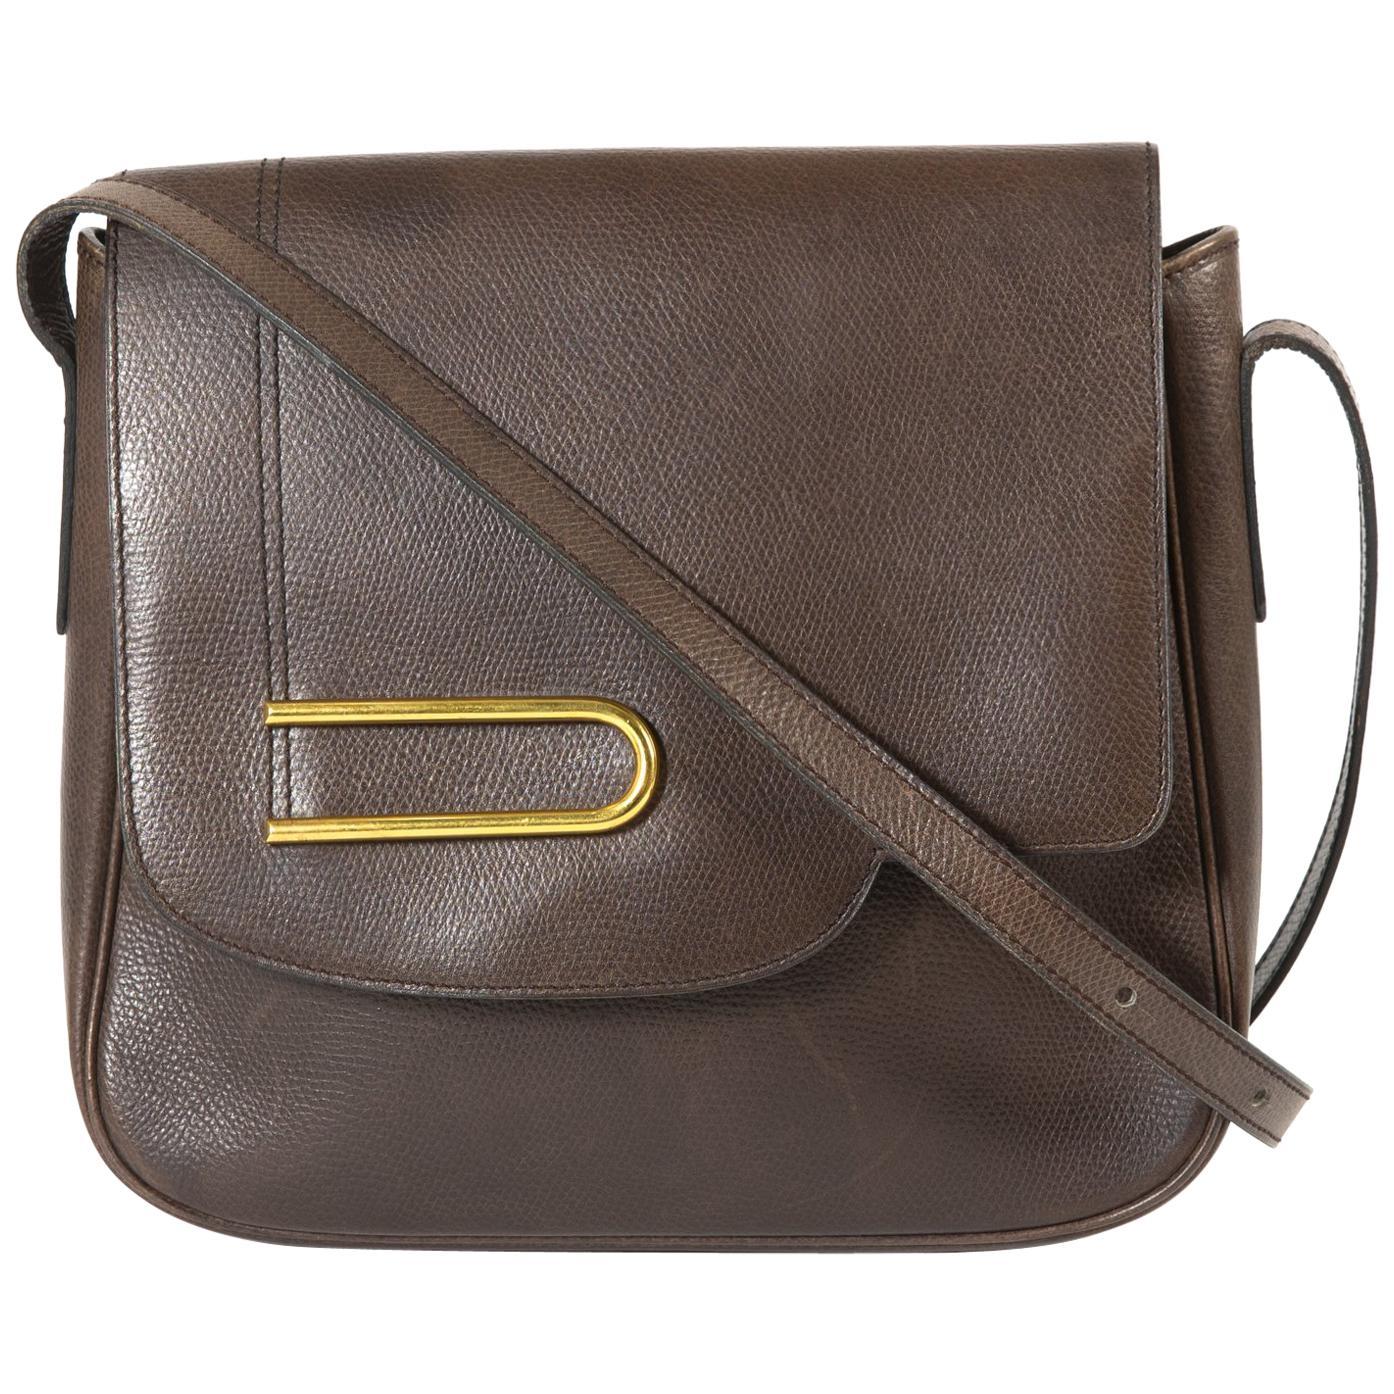 da03b345bfcc Labellov Crossbody Bags and Messenger Bags - 1stdibs